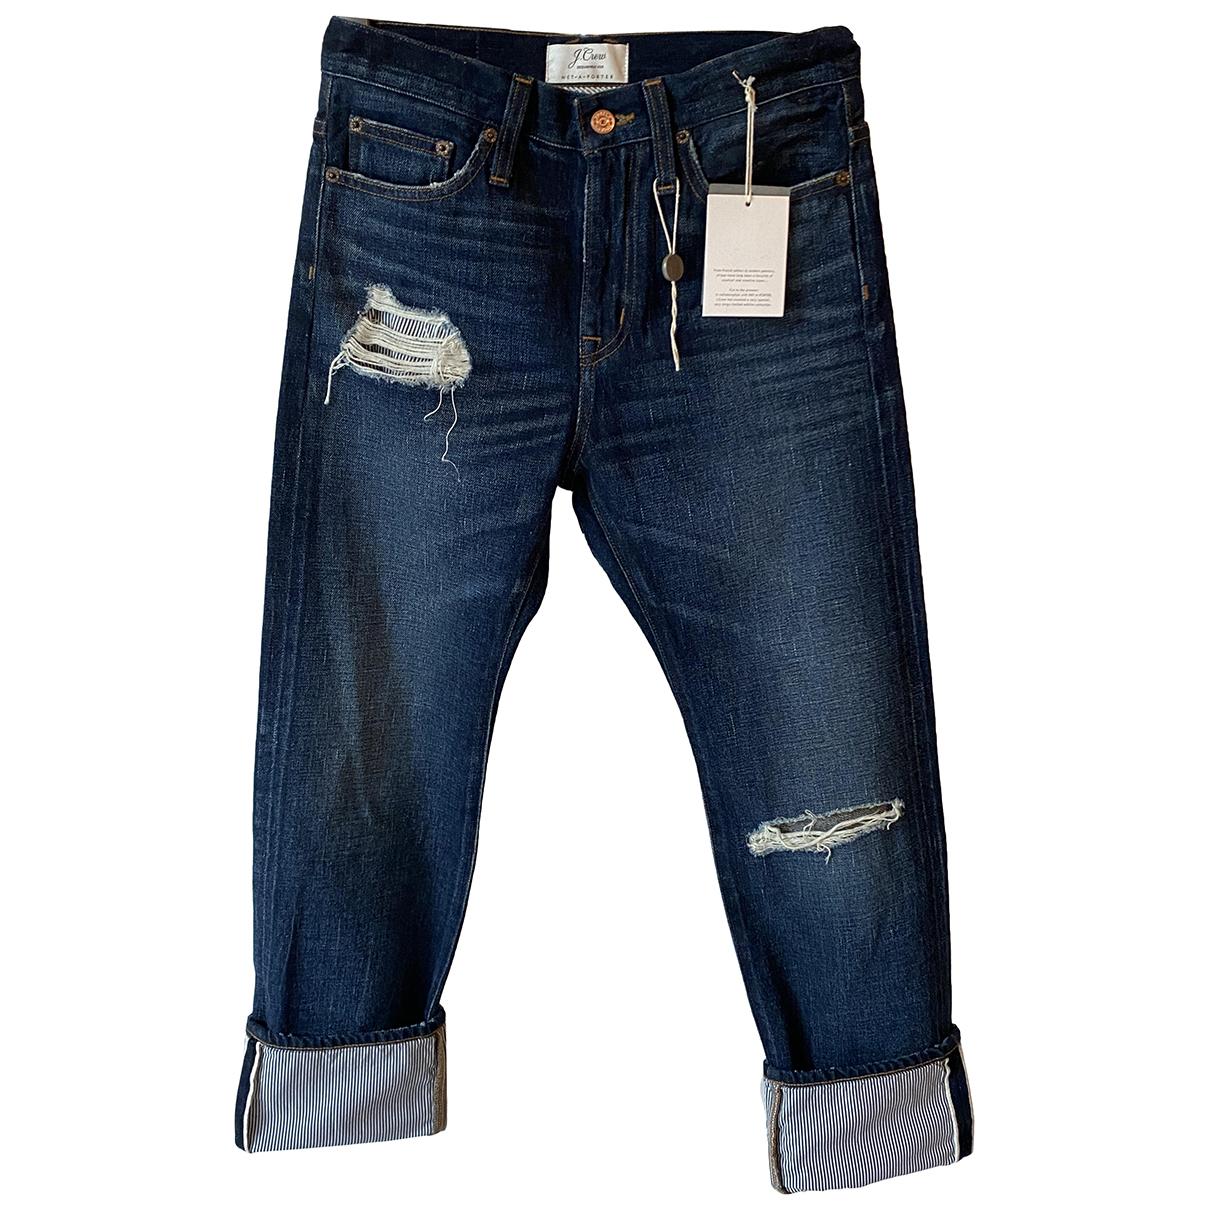 J.crew N Blue Cotton Jeans for Women 25 US